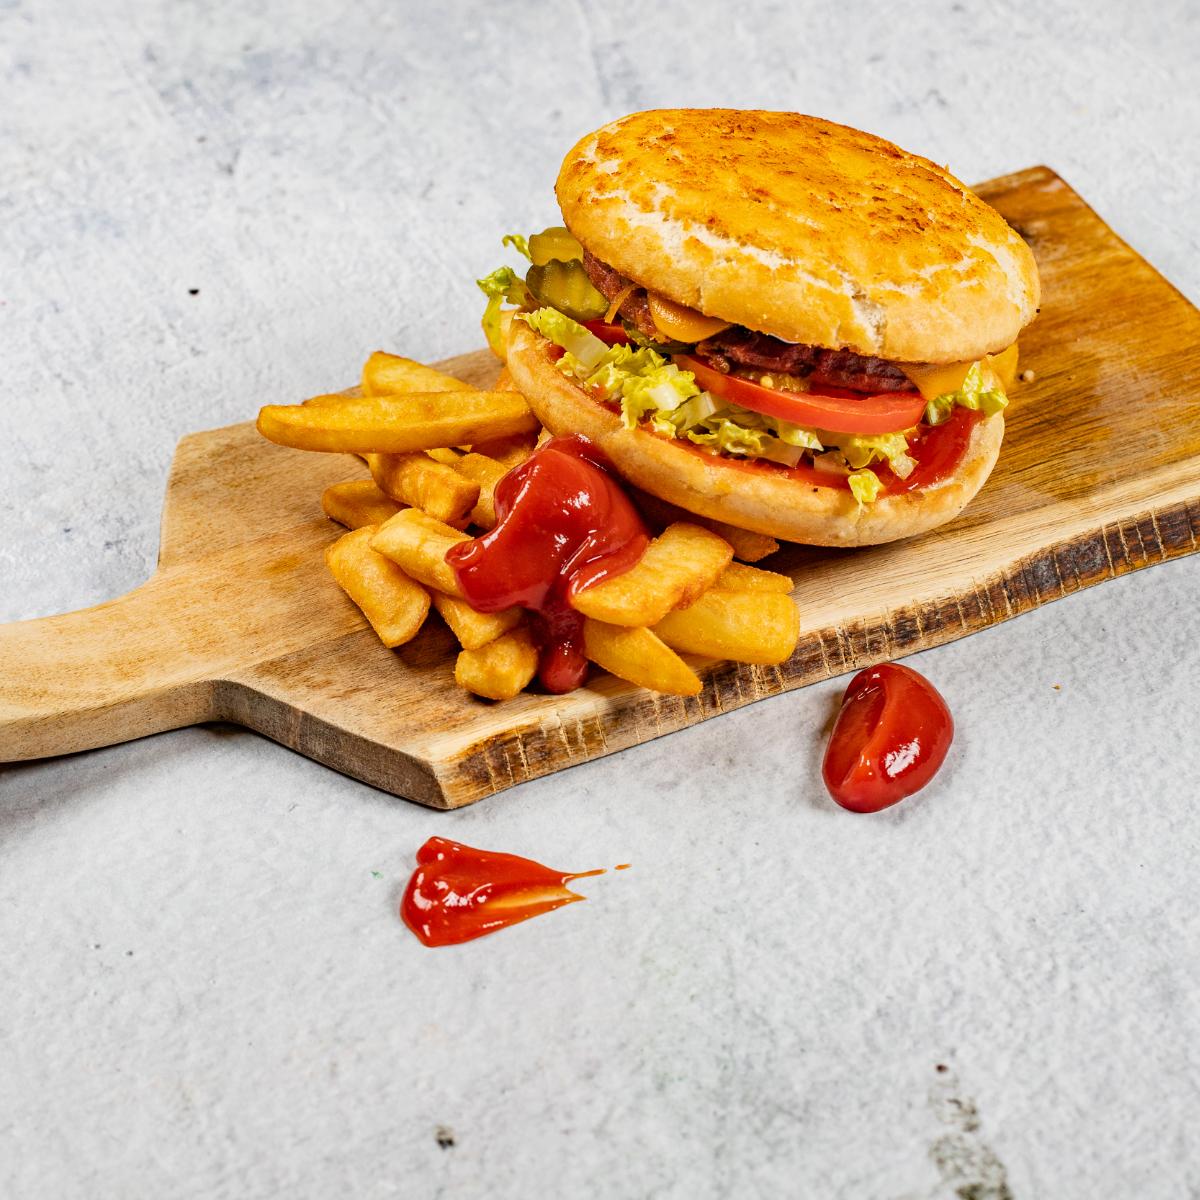 No Cheeseburger GoodnVegan